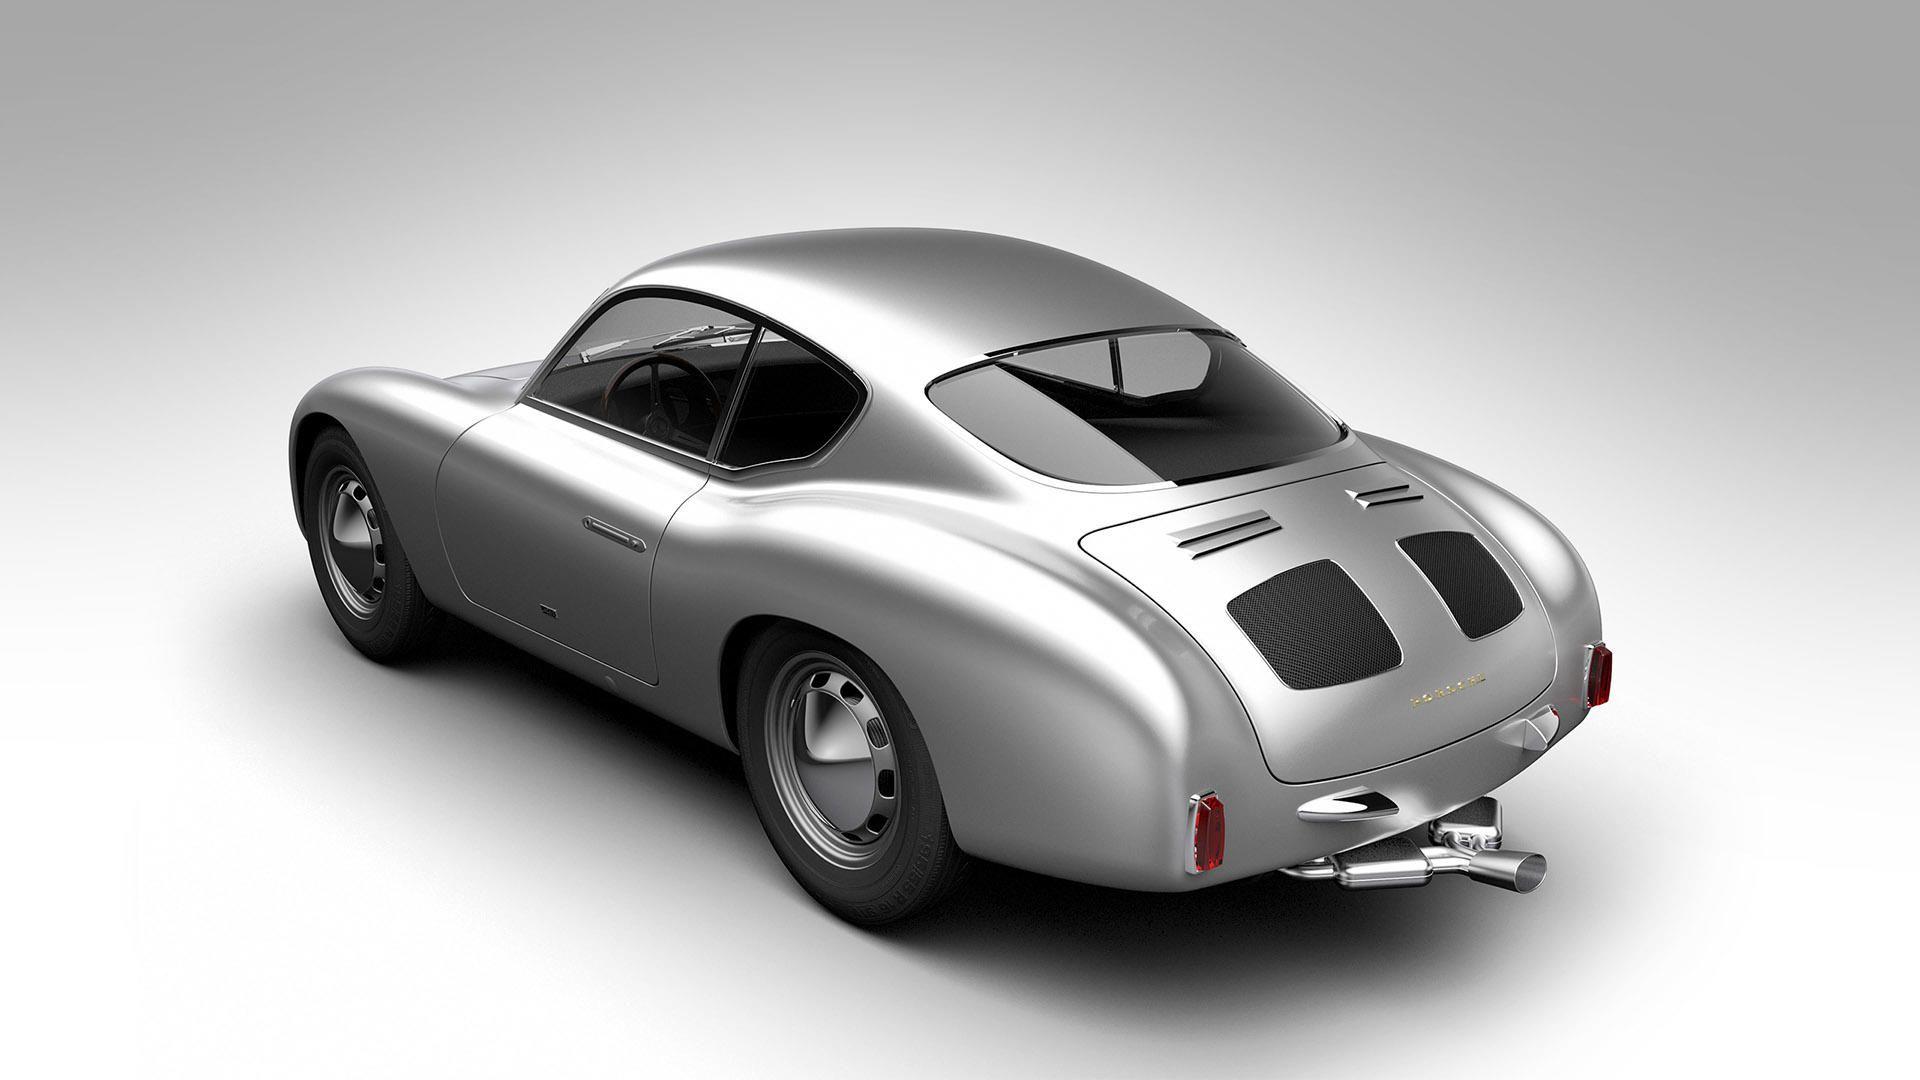 Zagato is reviving two incredible Porsche 356 projects | Porsche 356 ...